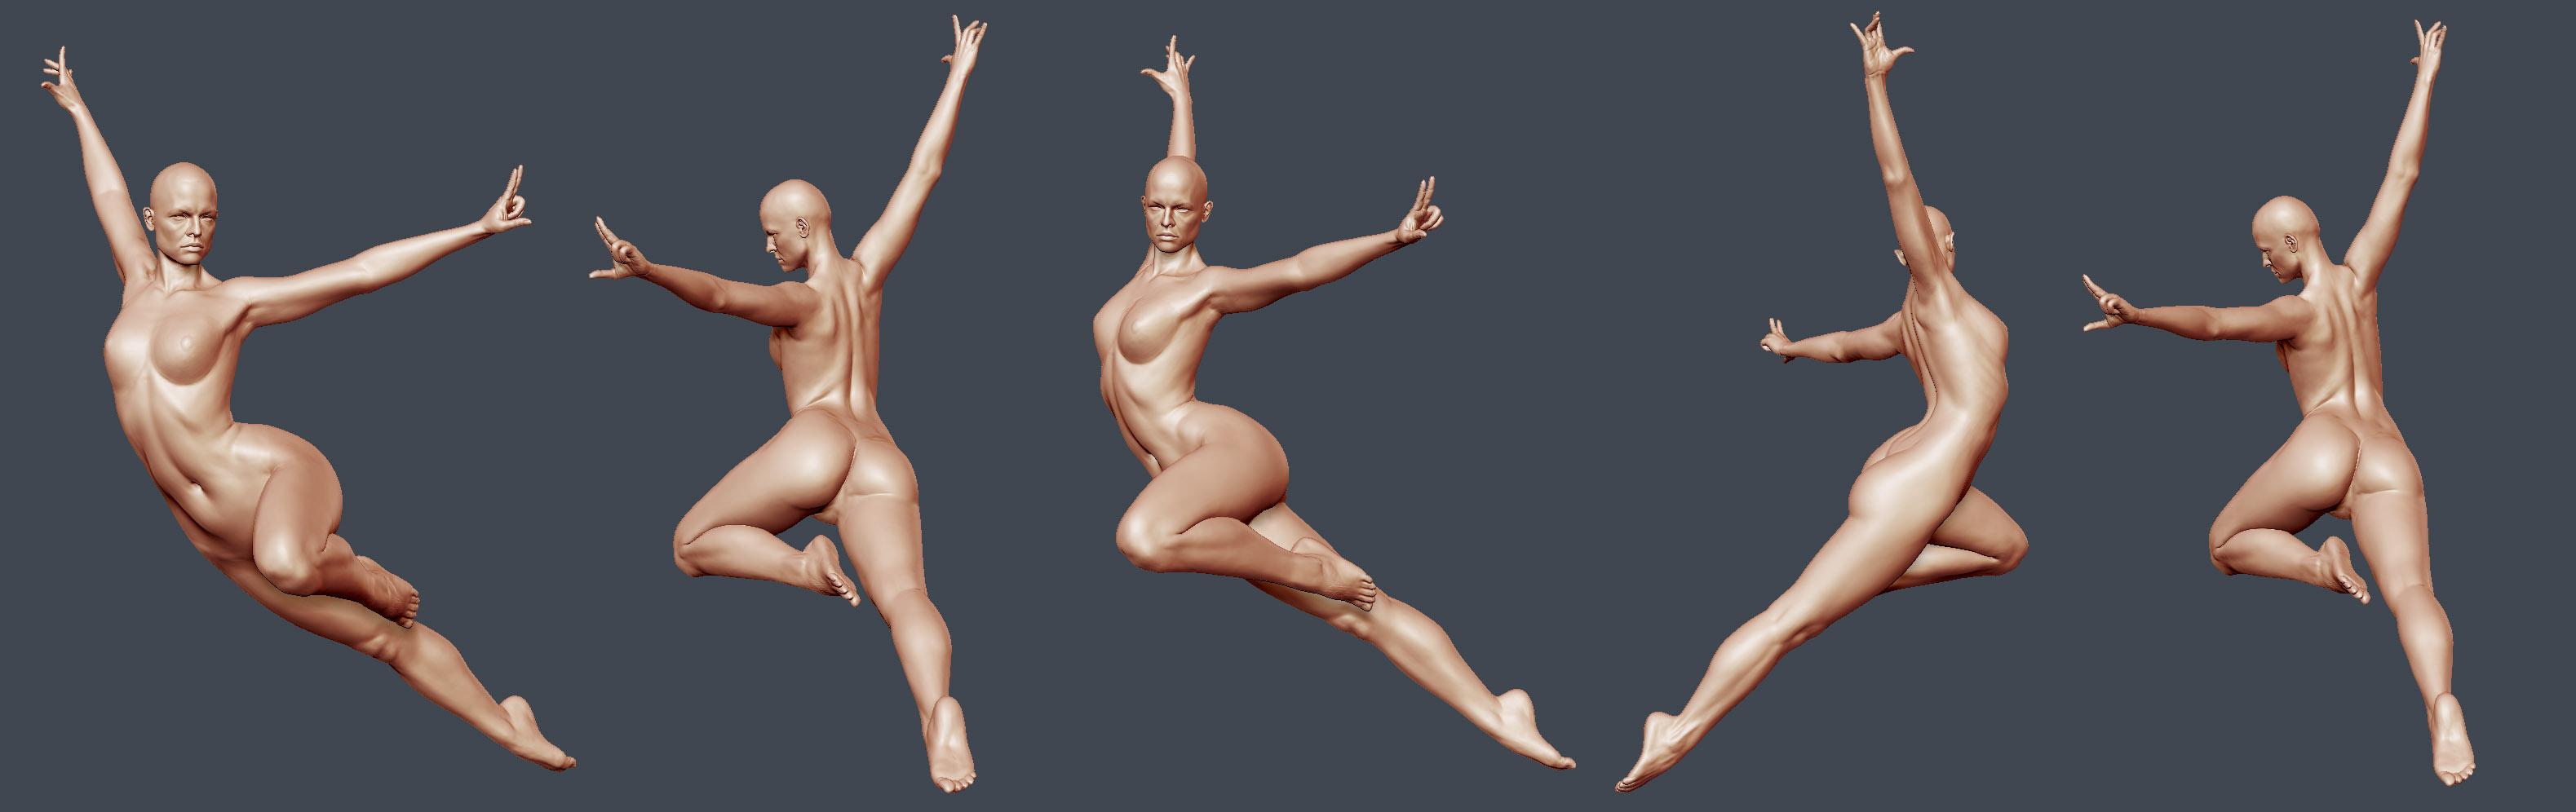 Naked girl playing